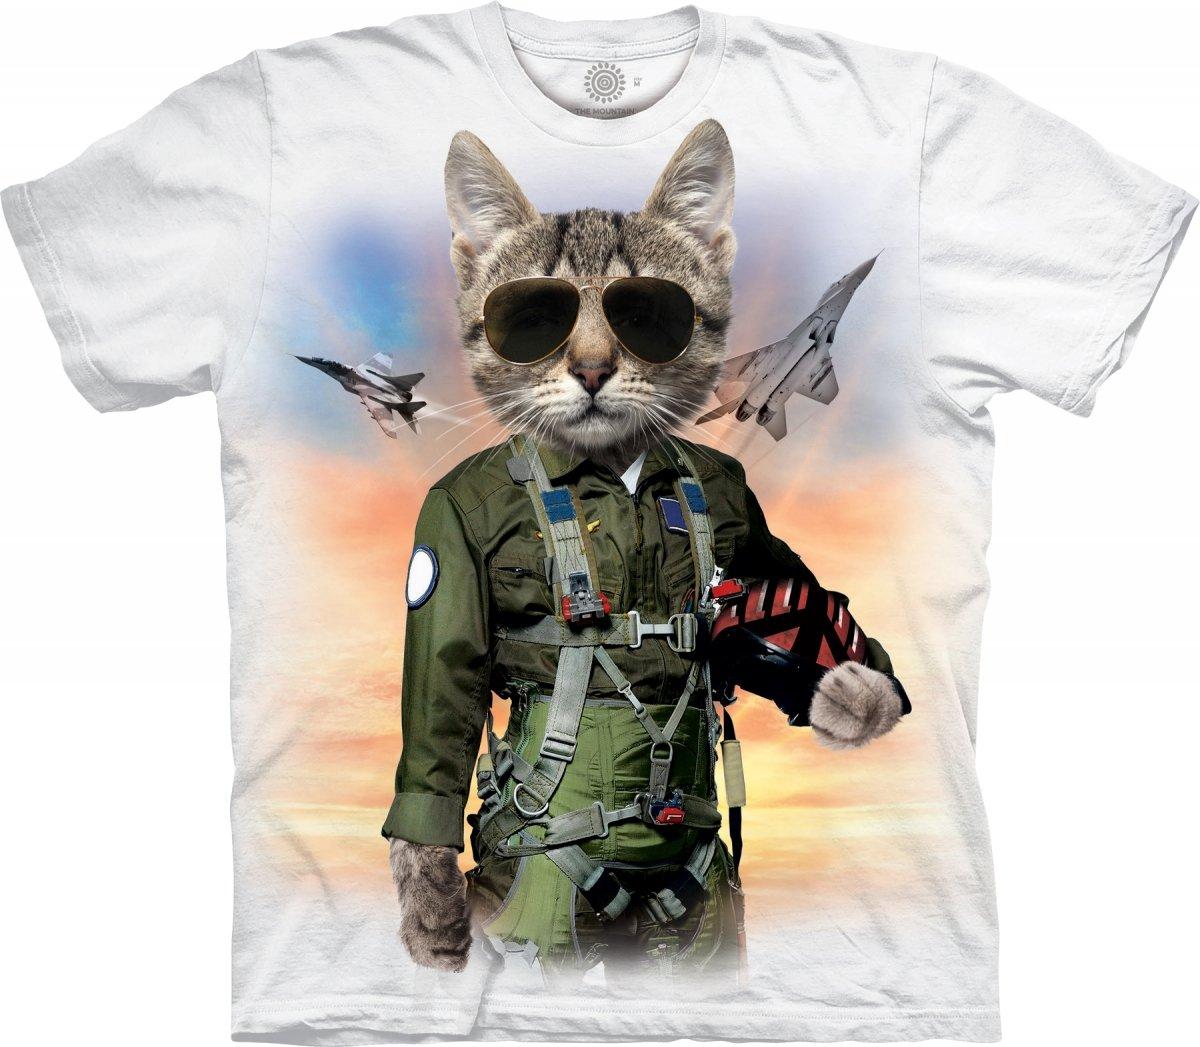 2cc3680e32a1e0 Sklep veoevo.pl - Koszulki Malowane Pazurem - Tom Cat White - The ...